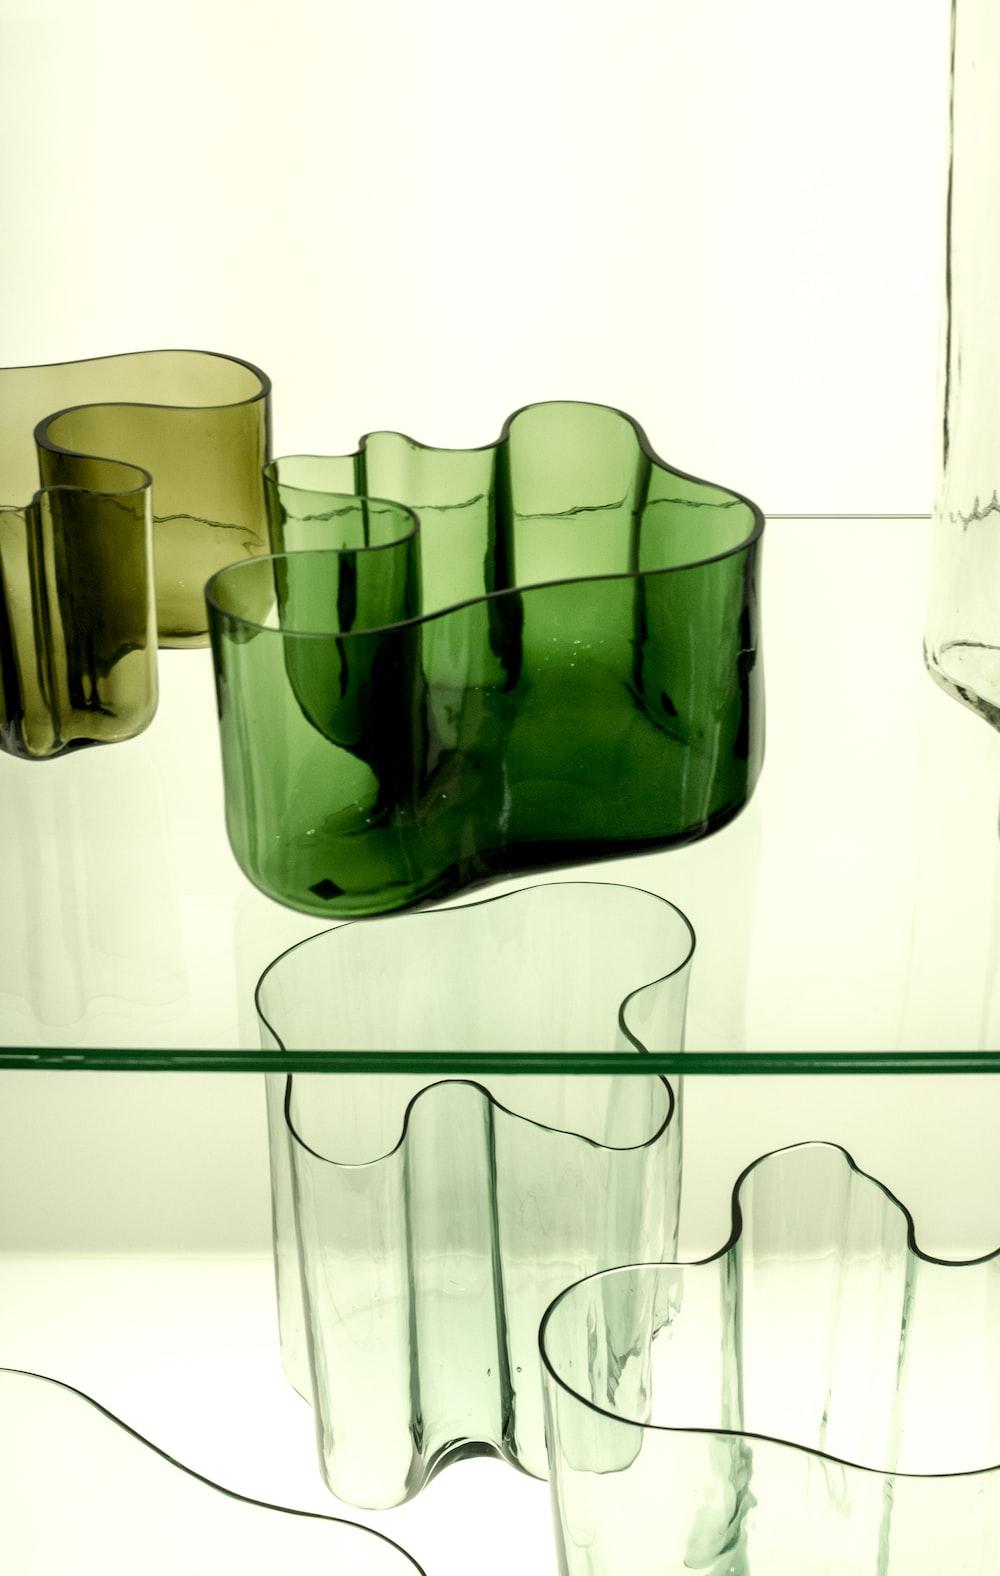 green glass vase on white table